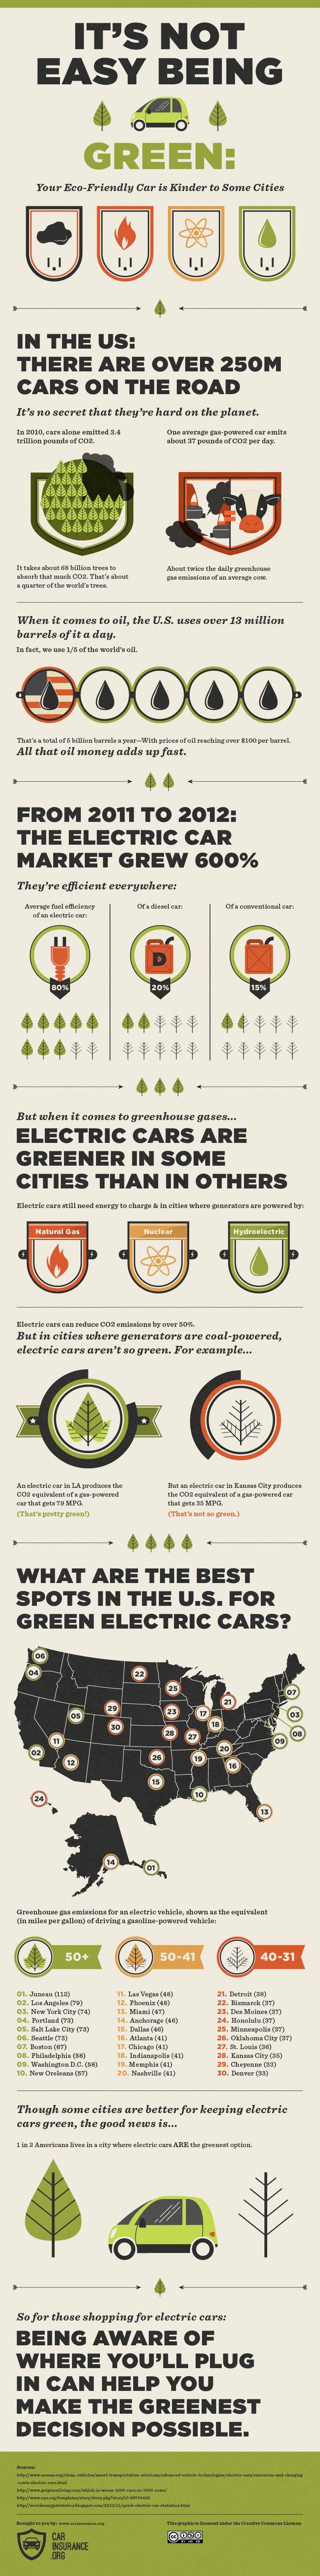 worksheet Who Killed The Electric Car Worksheet 163 best eco smart transport 26 49 images on pinterest green cars infographic